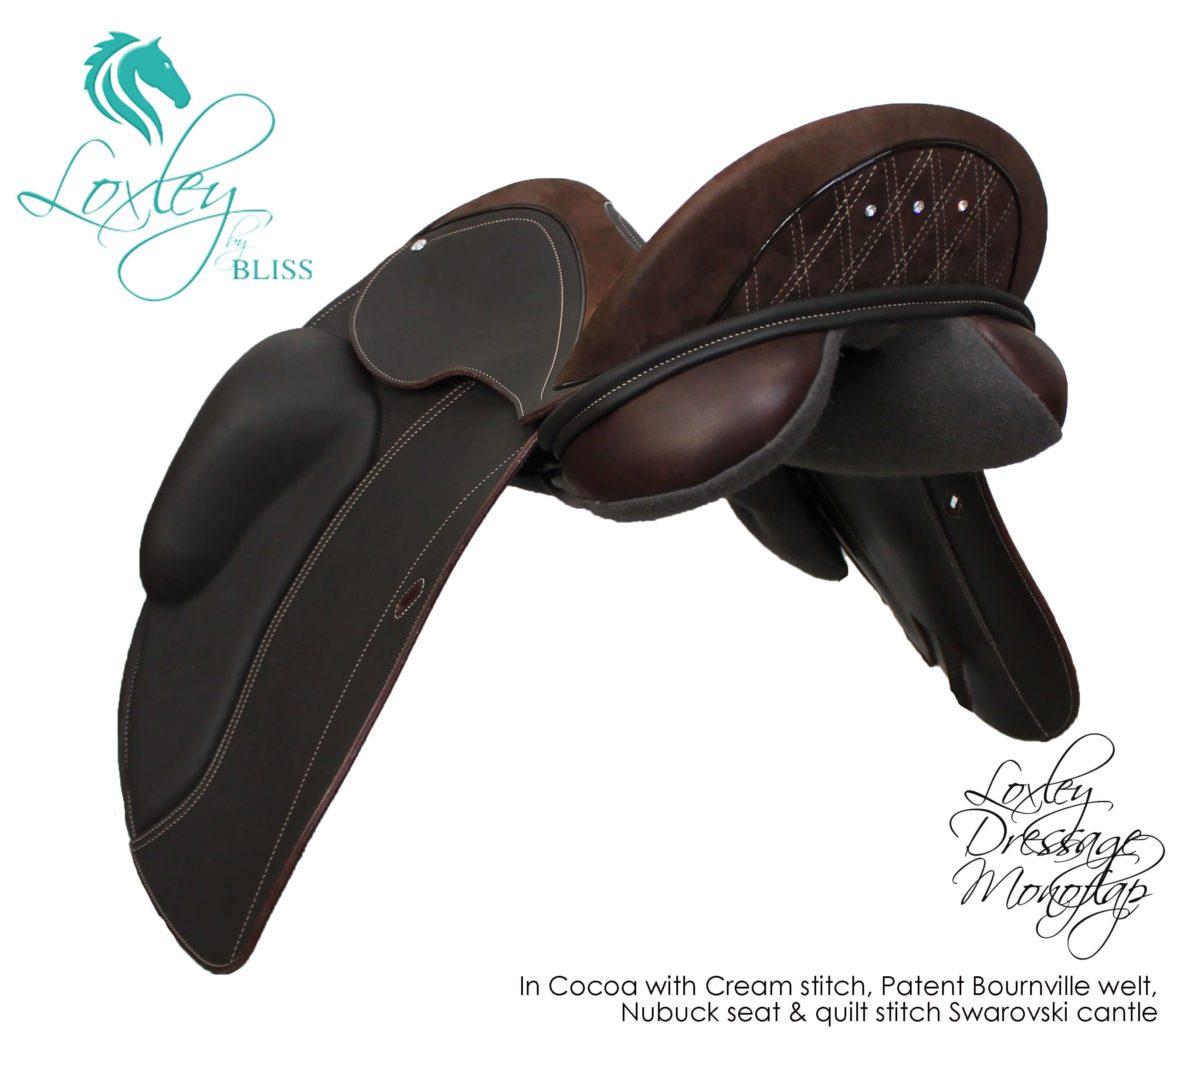 24 Loxley Dressage Mono - cocoa nubuck quilt stitch swarovski 34